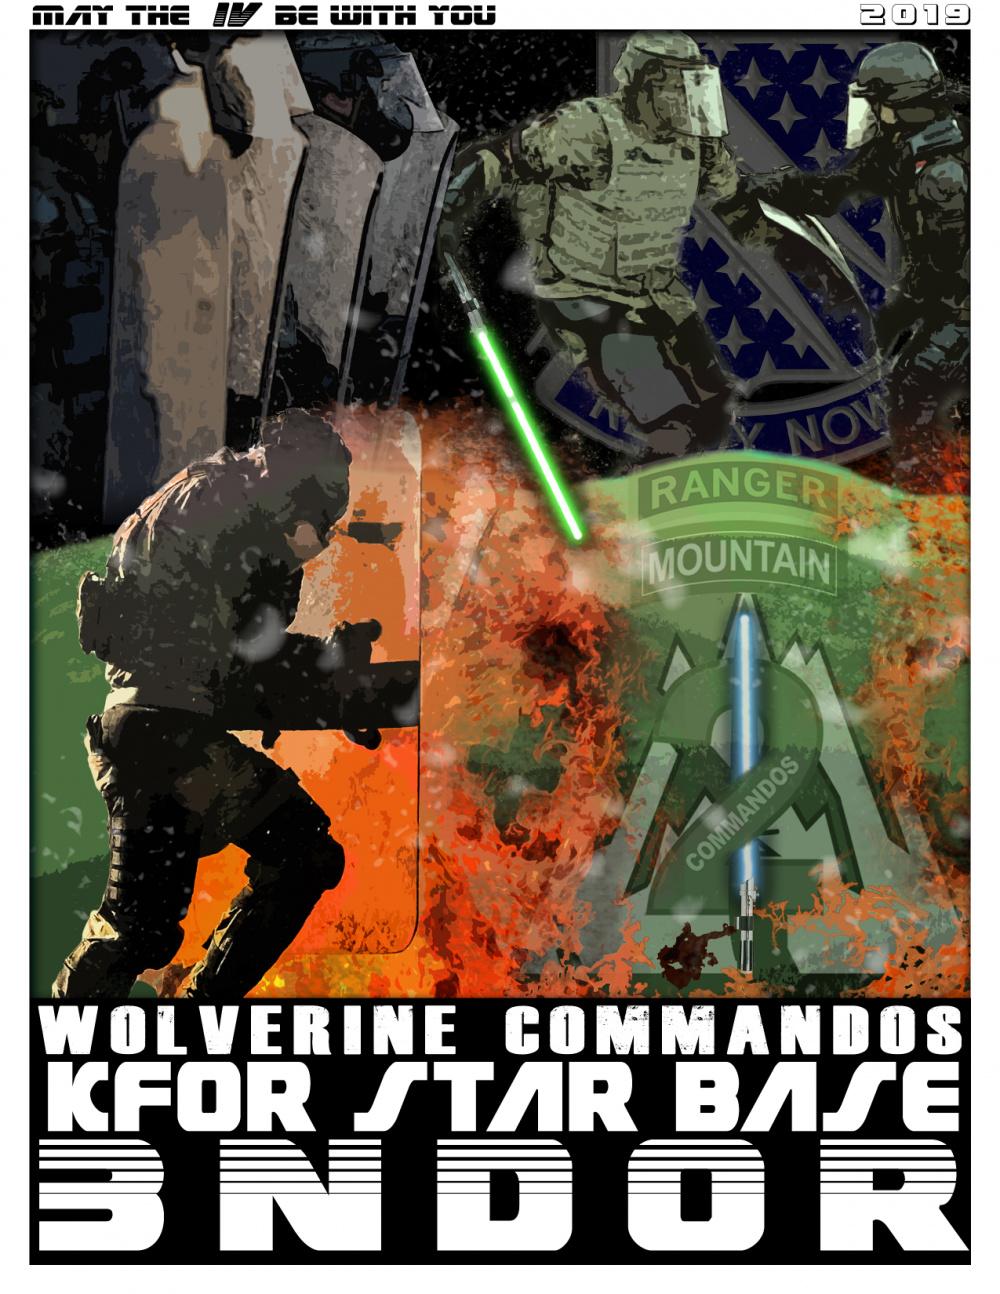 Commandos across the galaxy